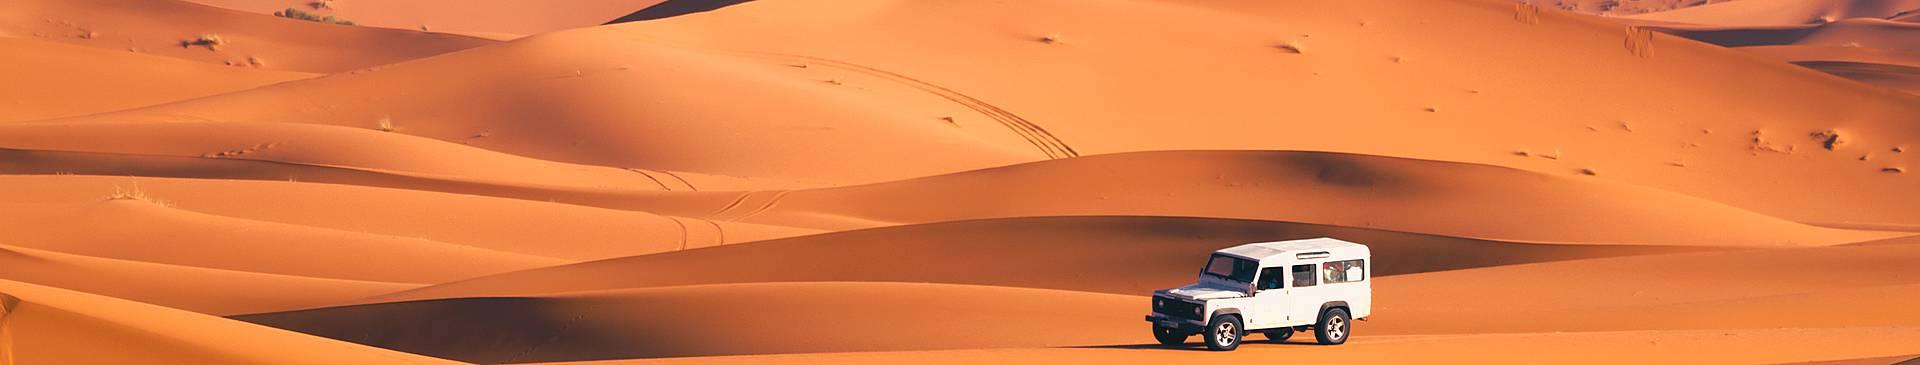 Namibia road trips